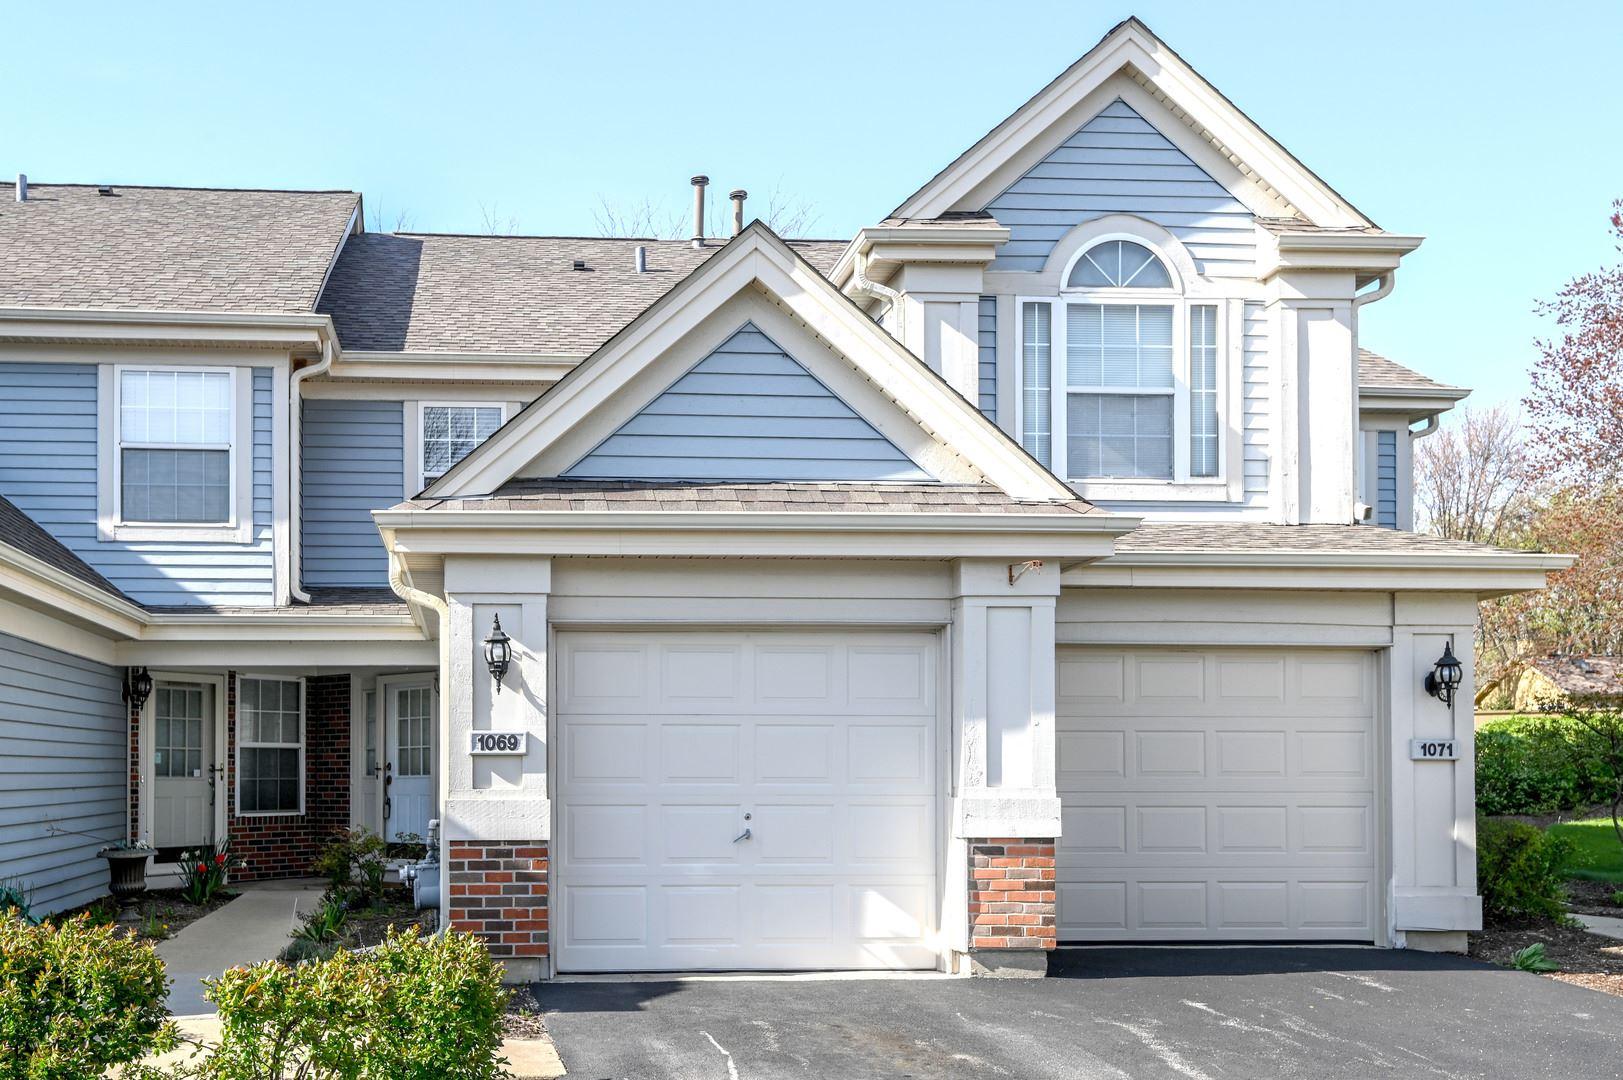 1069 Talbots Lane #105, Elk Grove Village, IL 60007 - #: 11063859